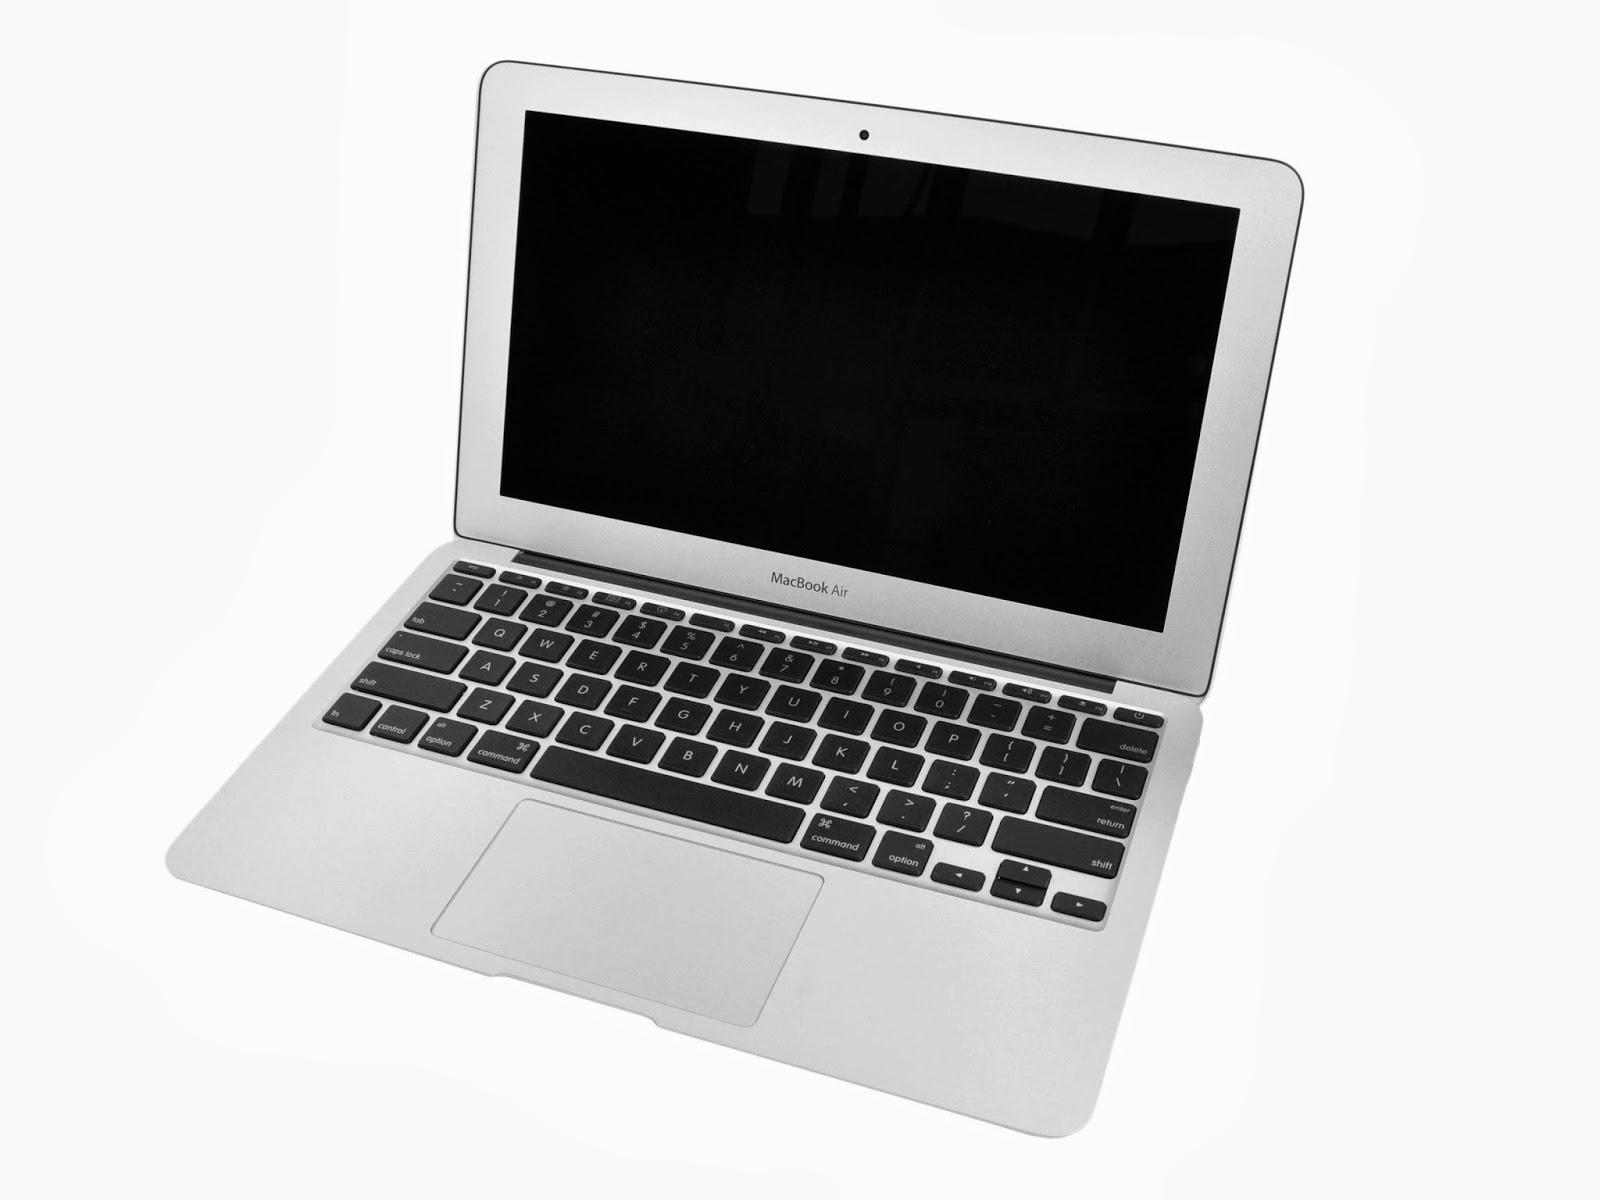 pdf apple download free games macbook pro